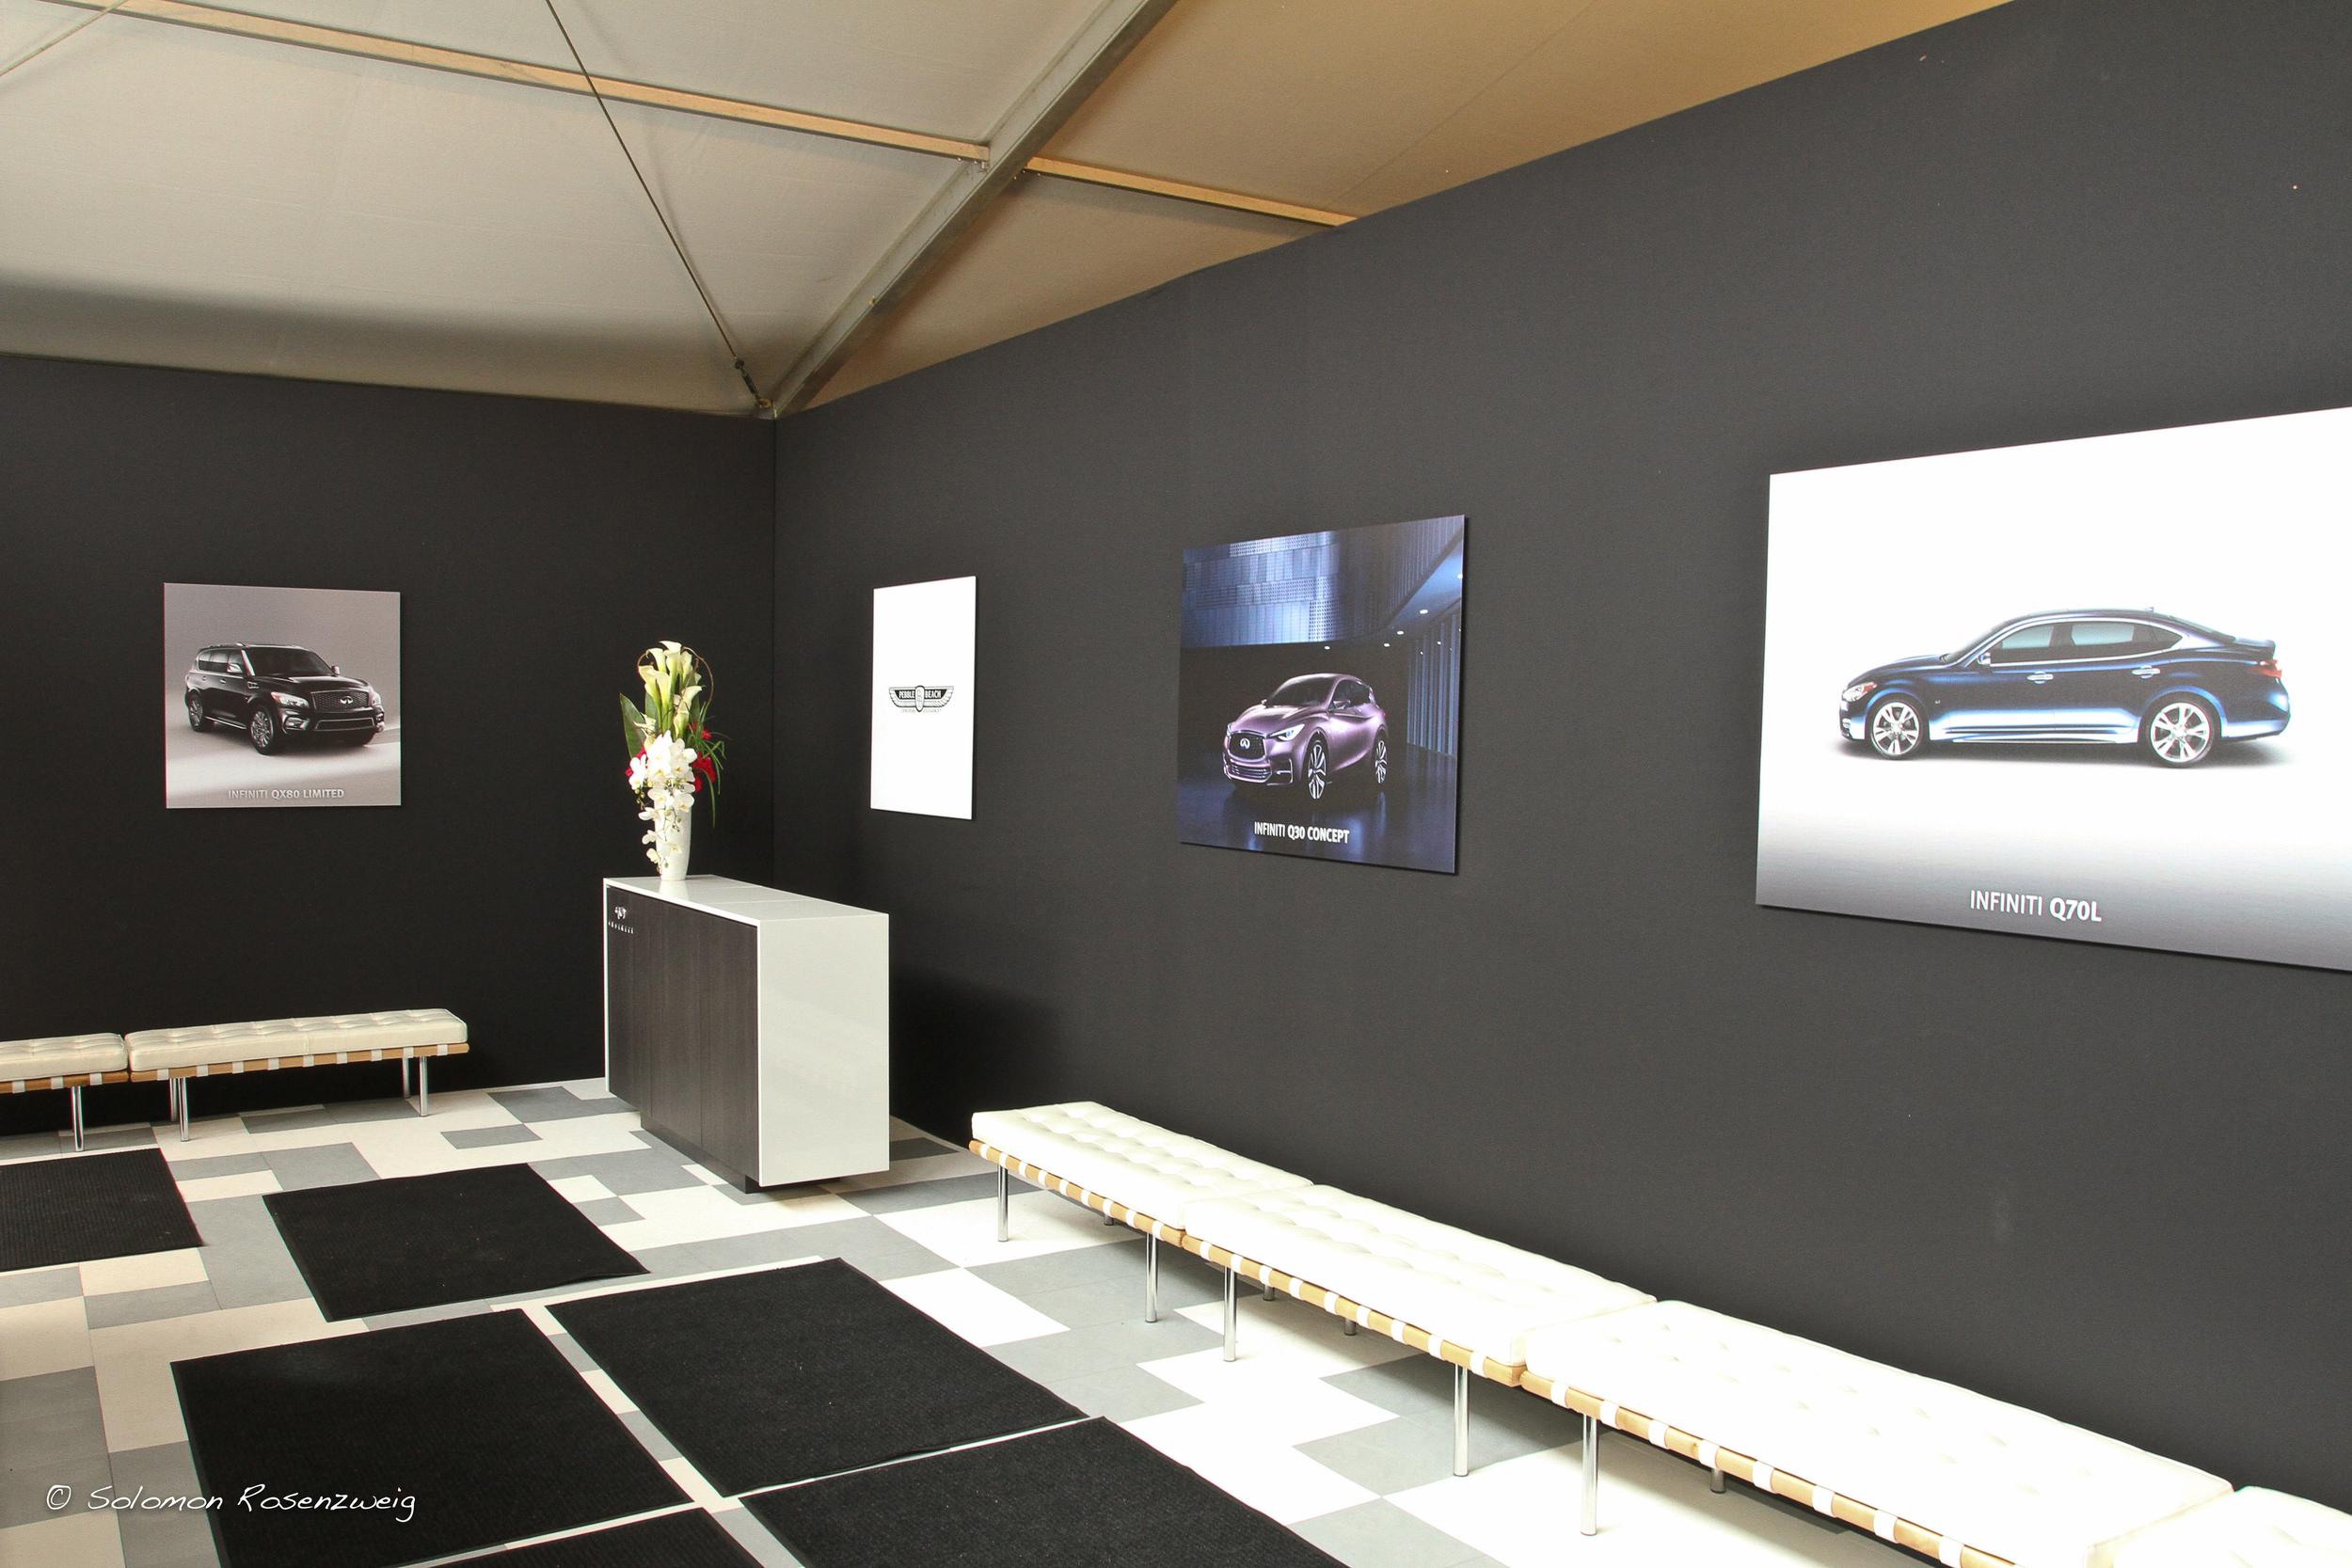 Ininiti Media Center Lounge 2014